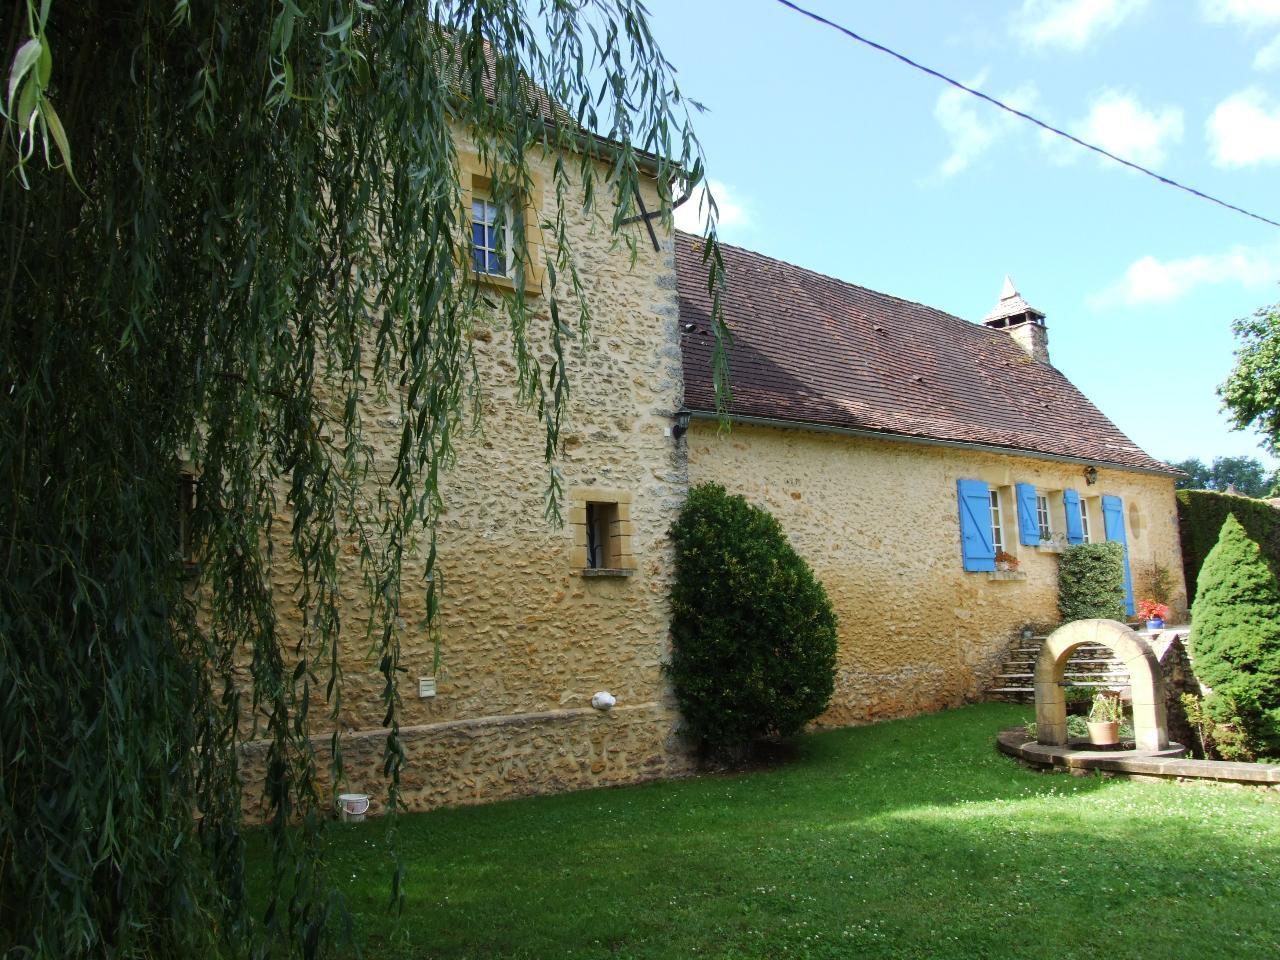 Maison du XVII eme siècle